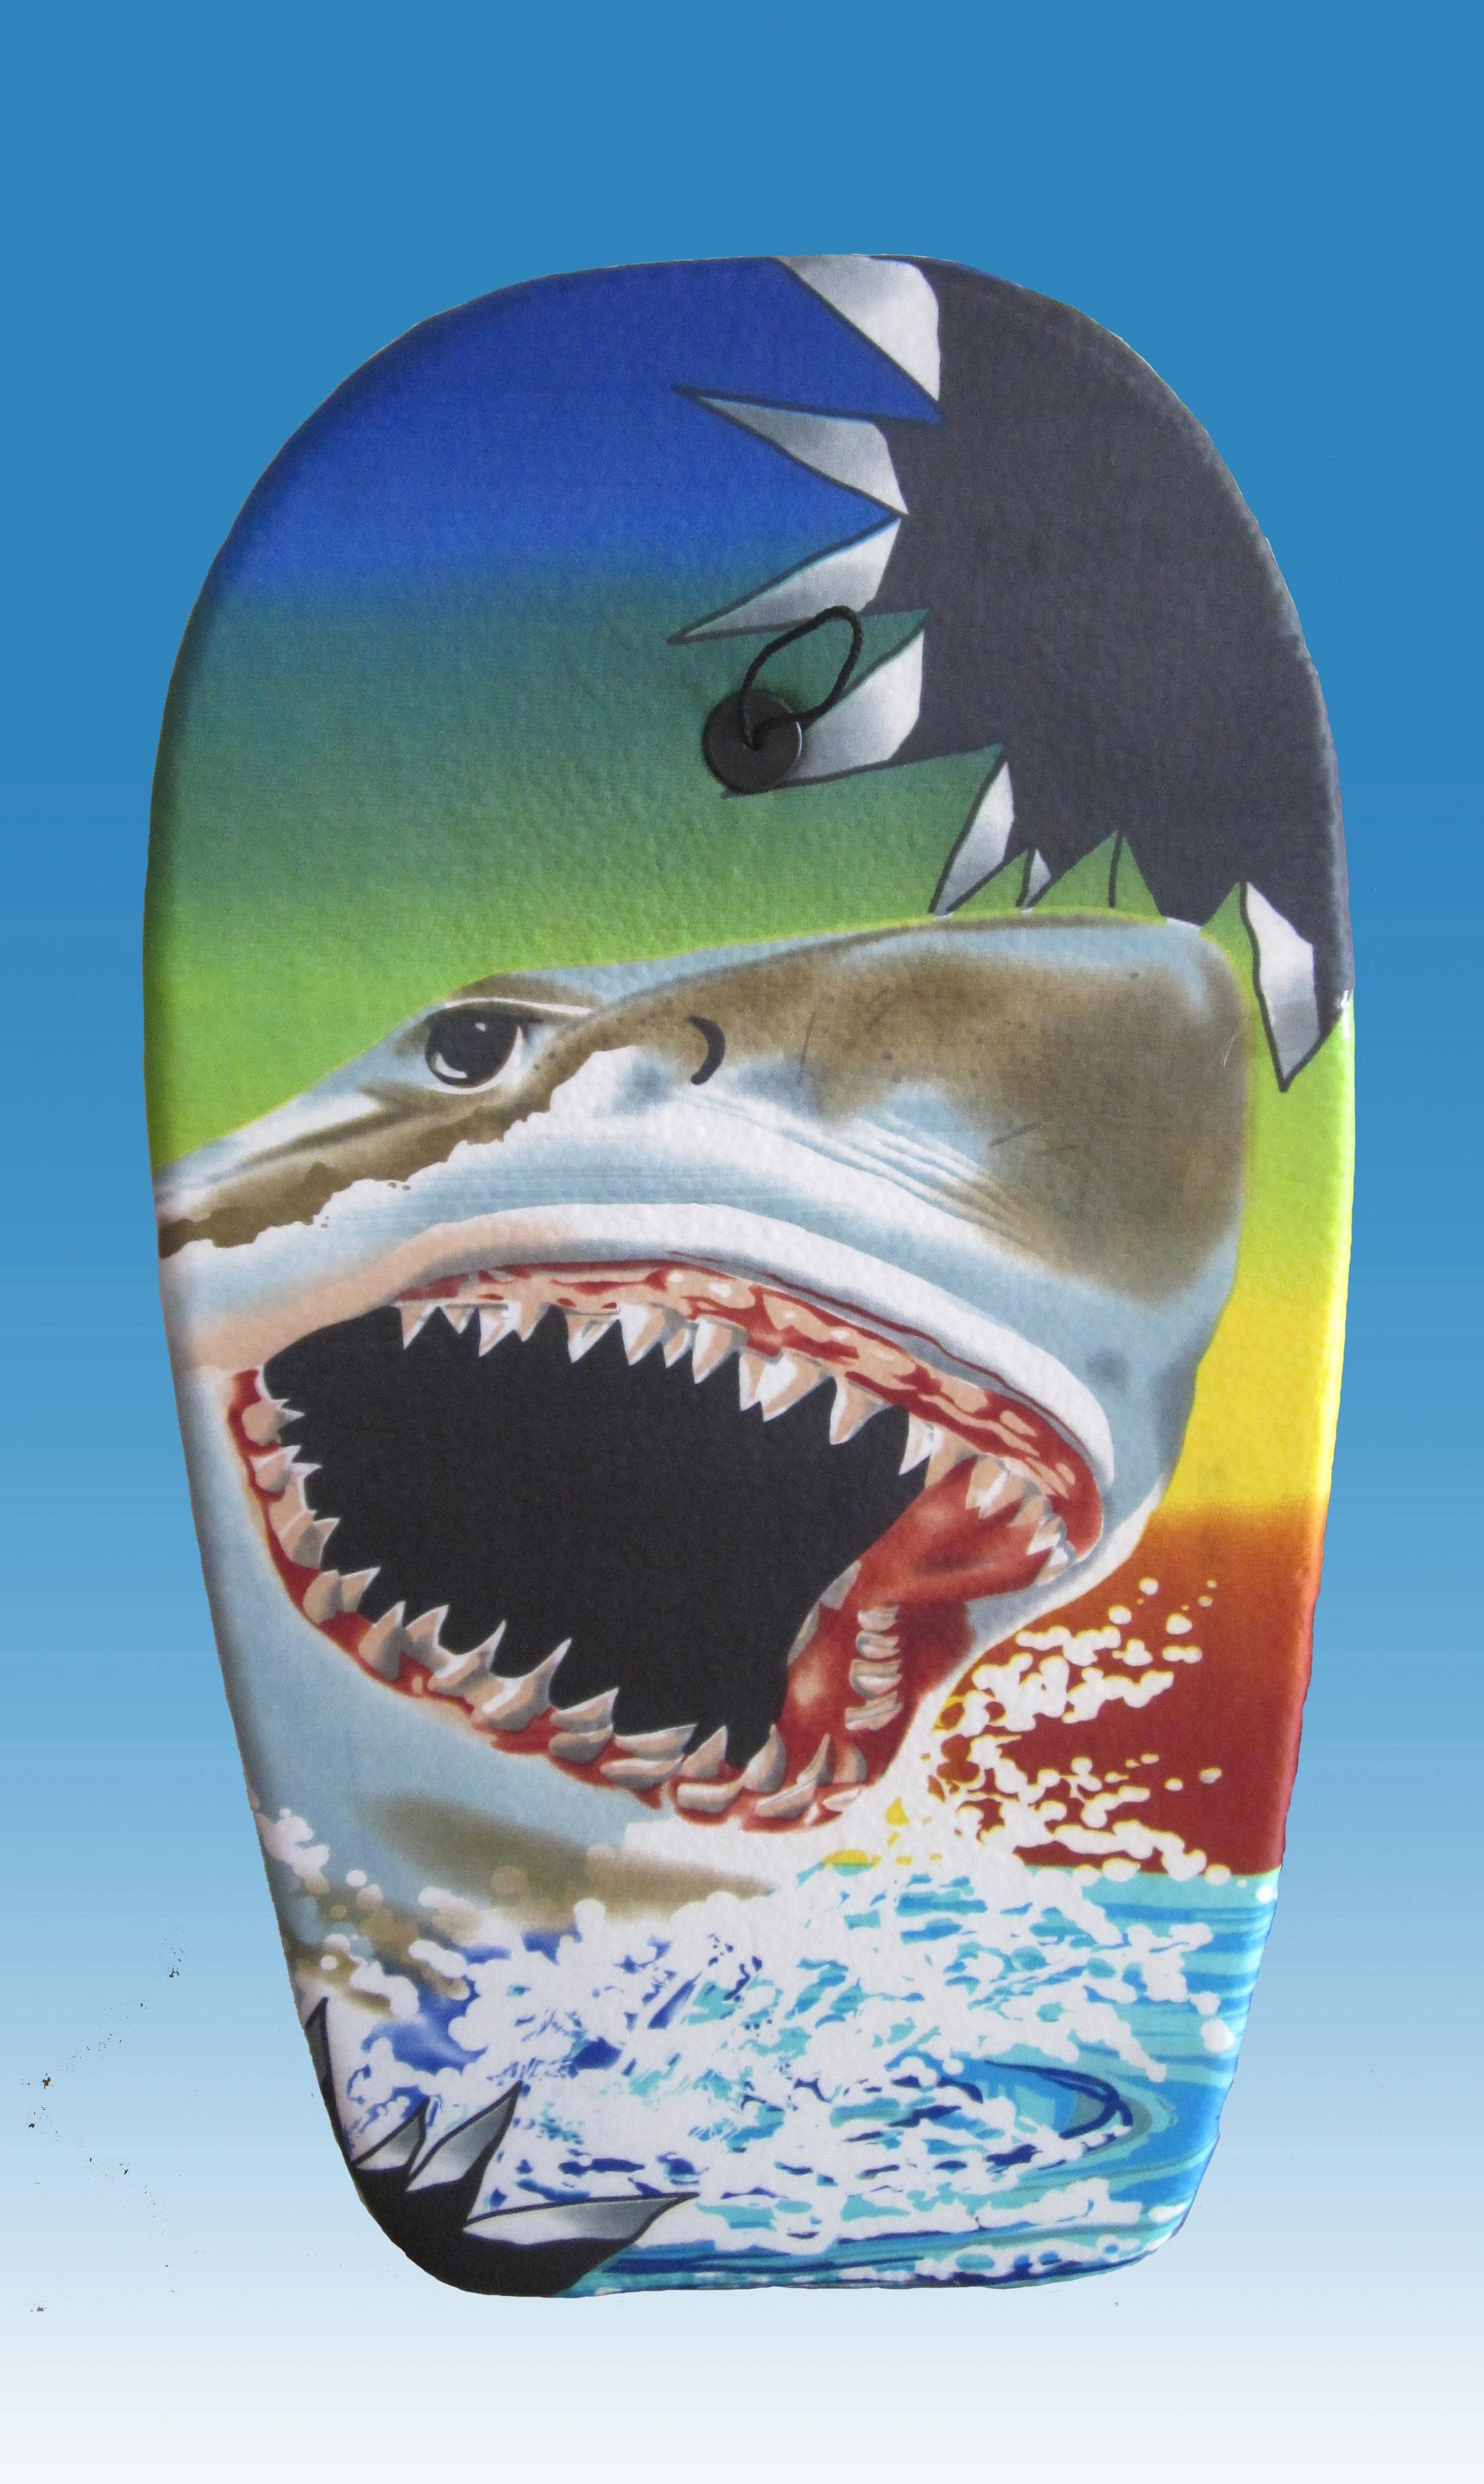 Bodyboard Shark ca. 94 cm Schwimmbrett Schwimmboard Sommer Pool